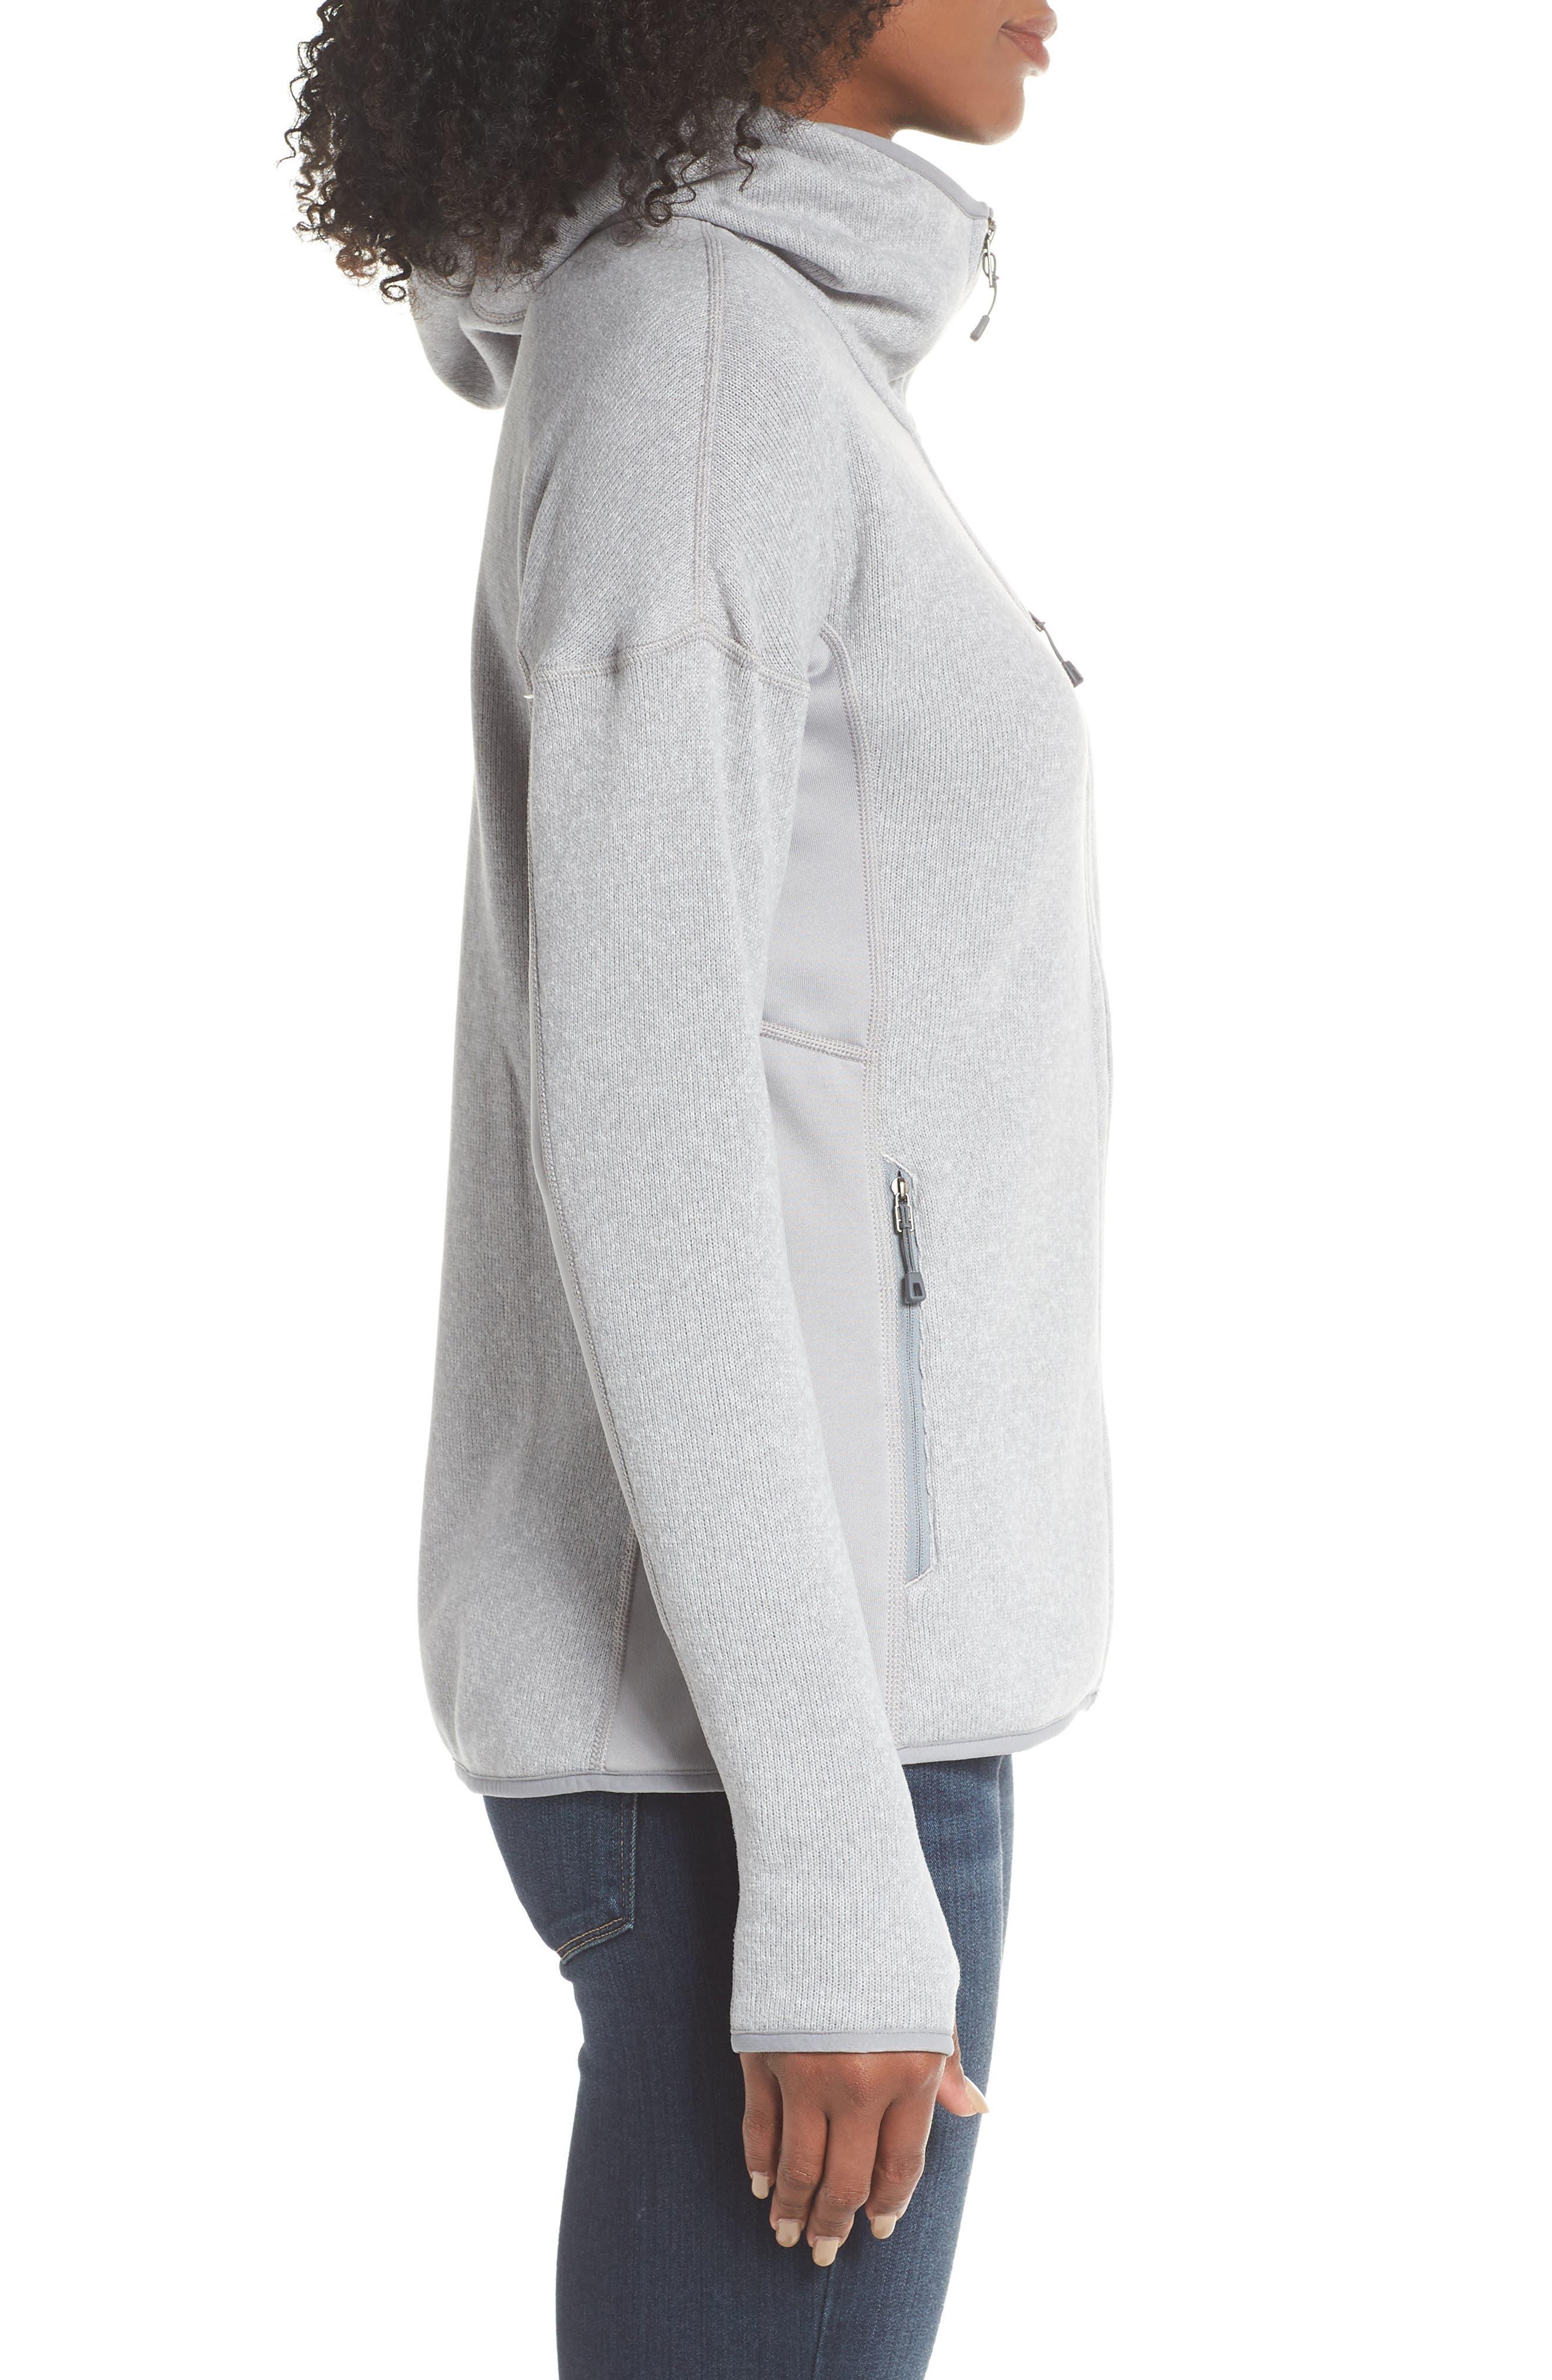 Performance Better Sweater Hoodie,                             Alternate thumbnail 3, color,                             DRIFT GREY